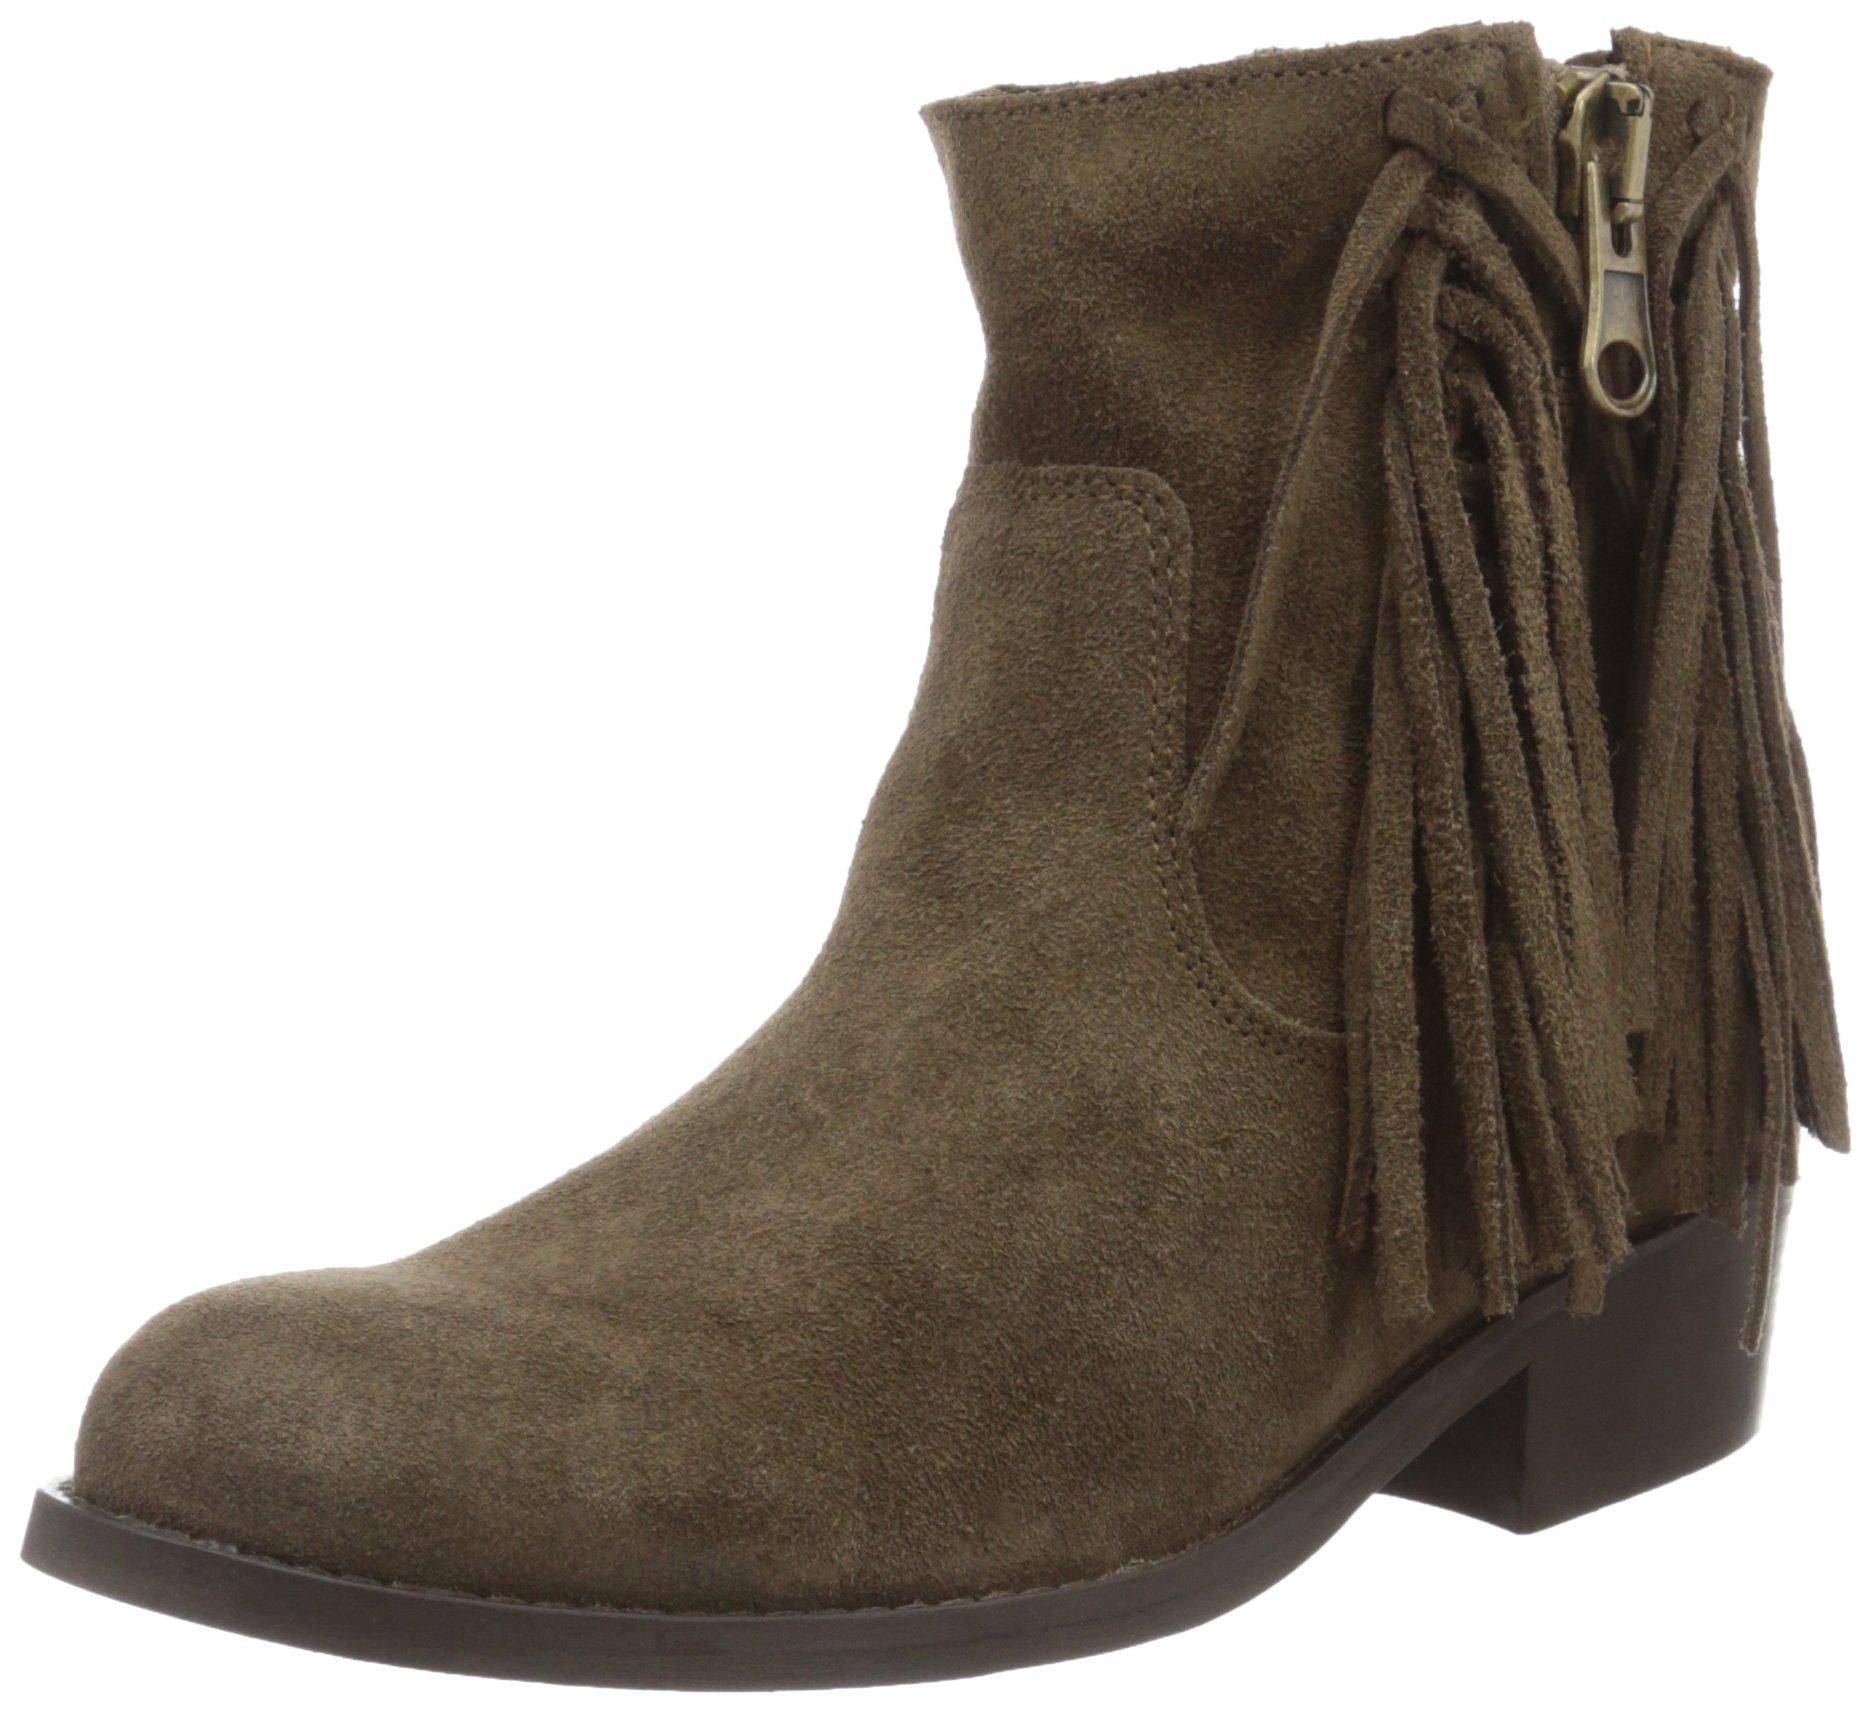 wrangler women 39 s pampa fringes ankle boots brown braun. Black Bedroom Furniture Sets. Home Design Ideas